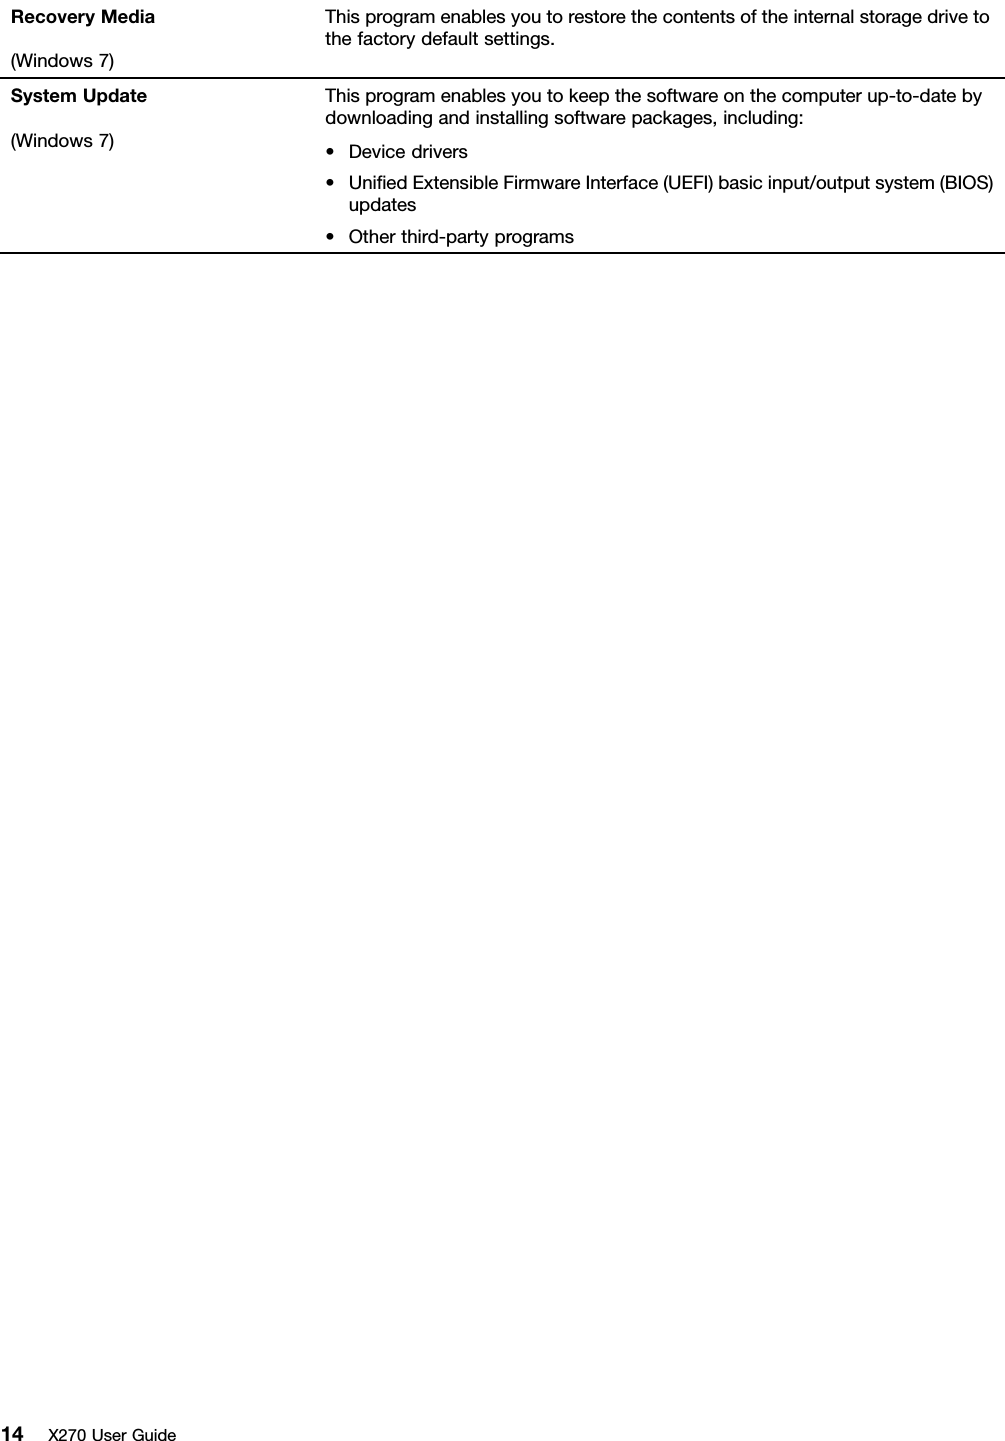 Lenovo X270 Ug En User Manual (English) Guide Think Pad (Type 20HN